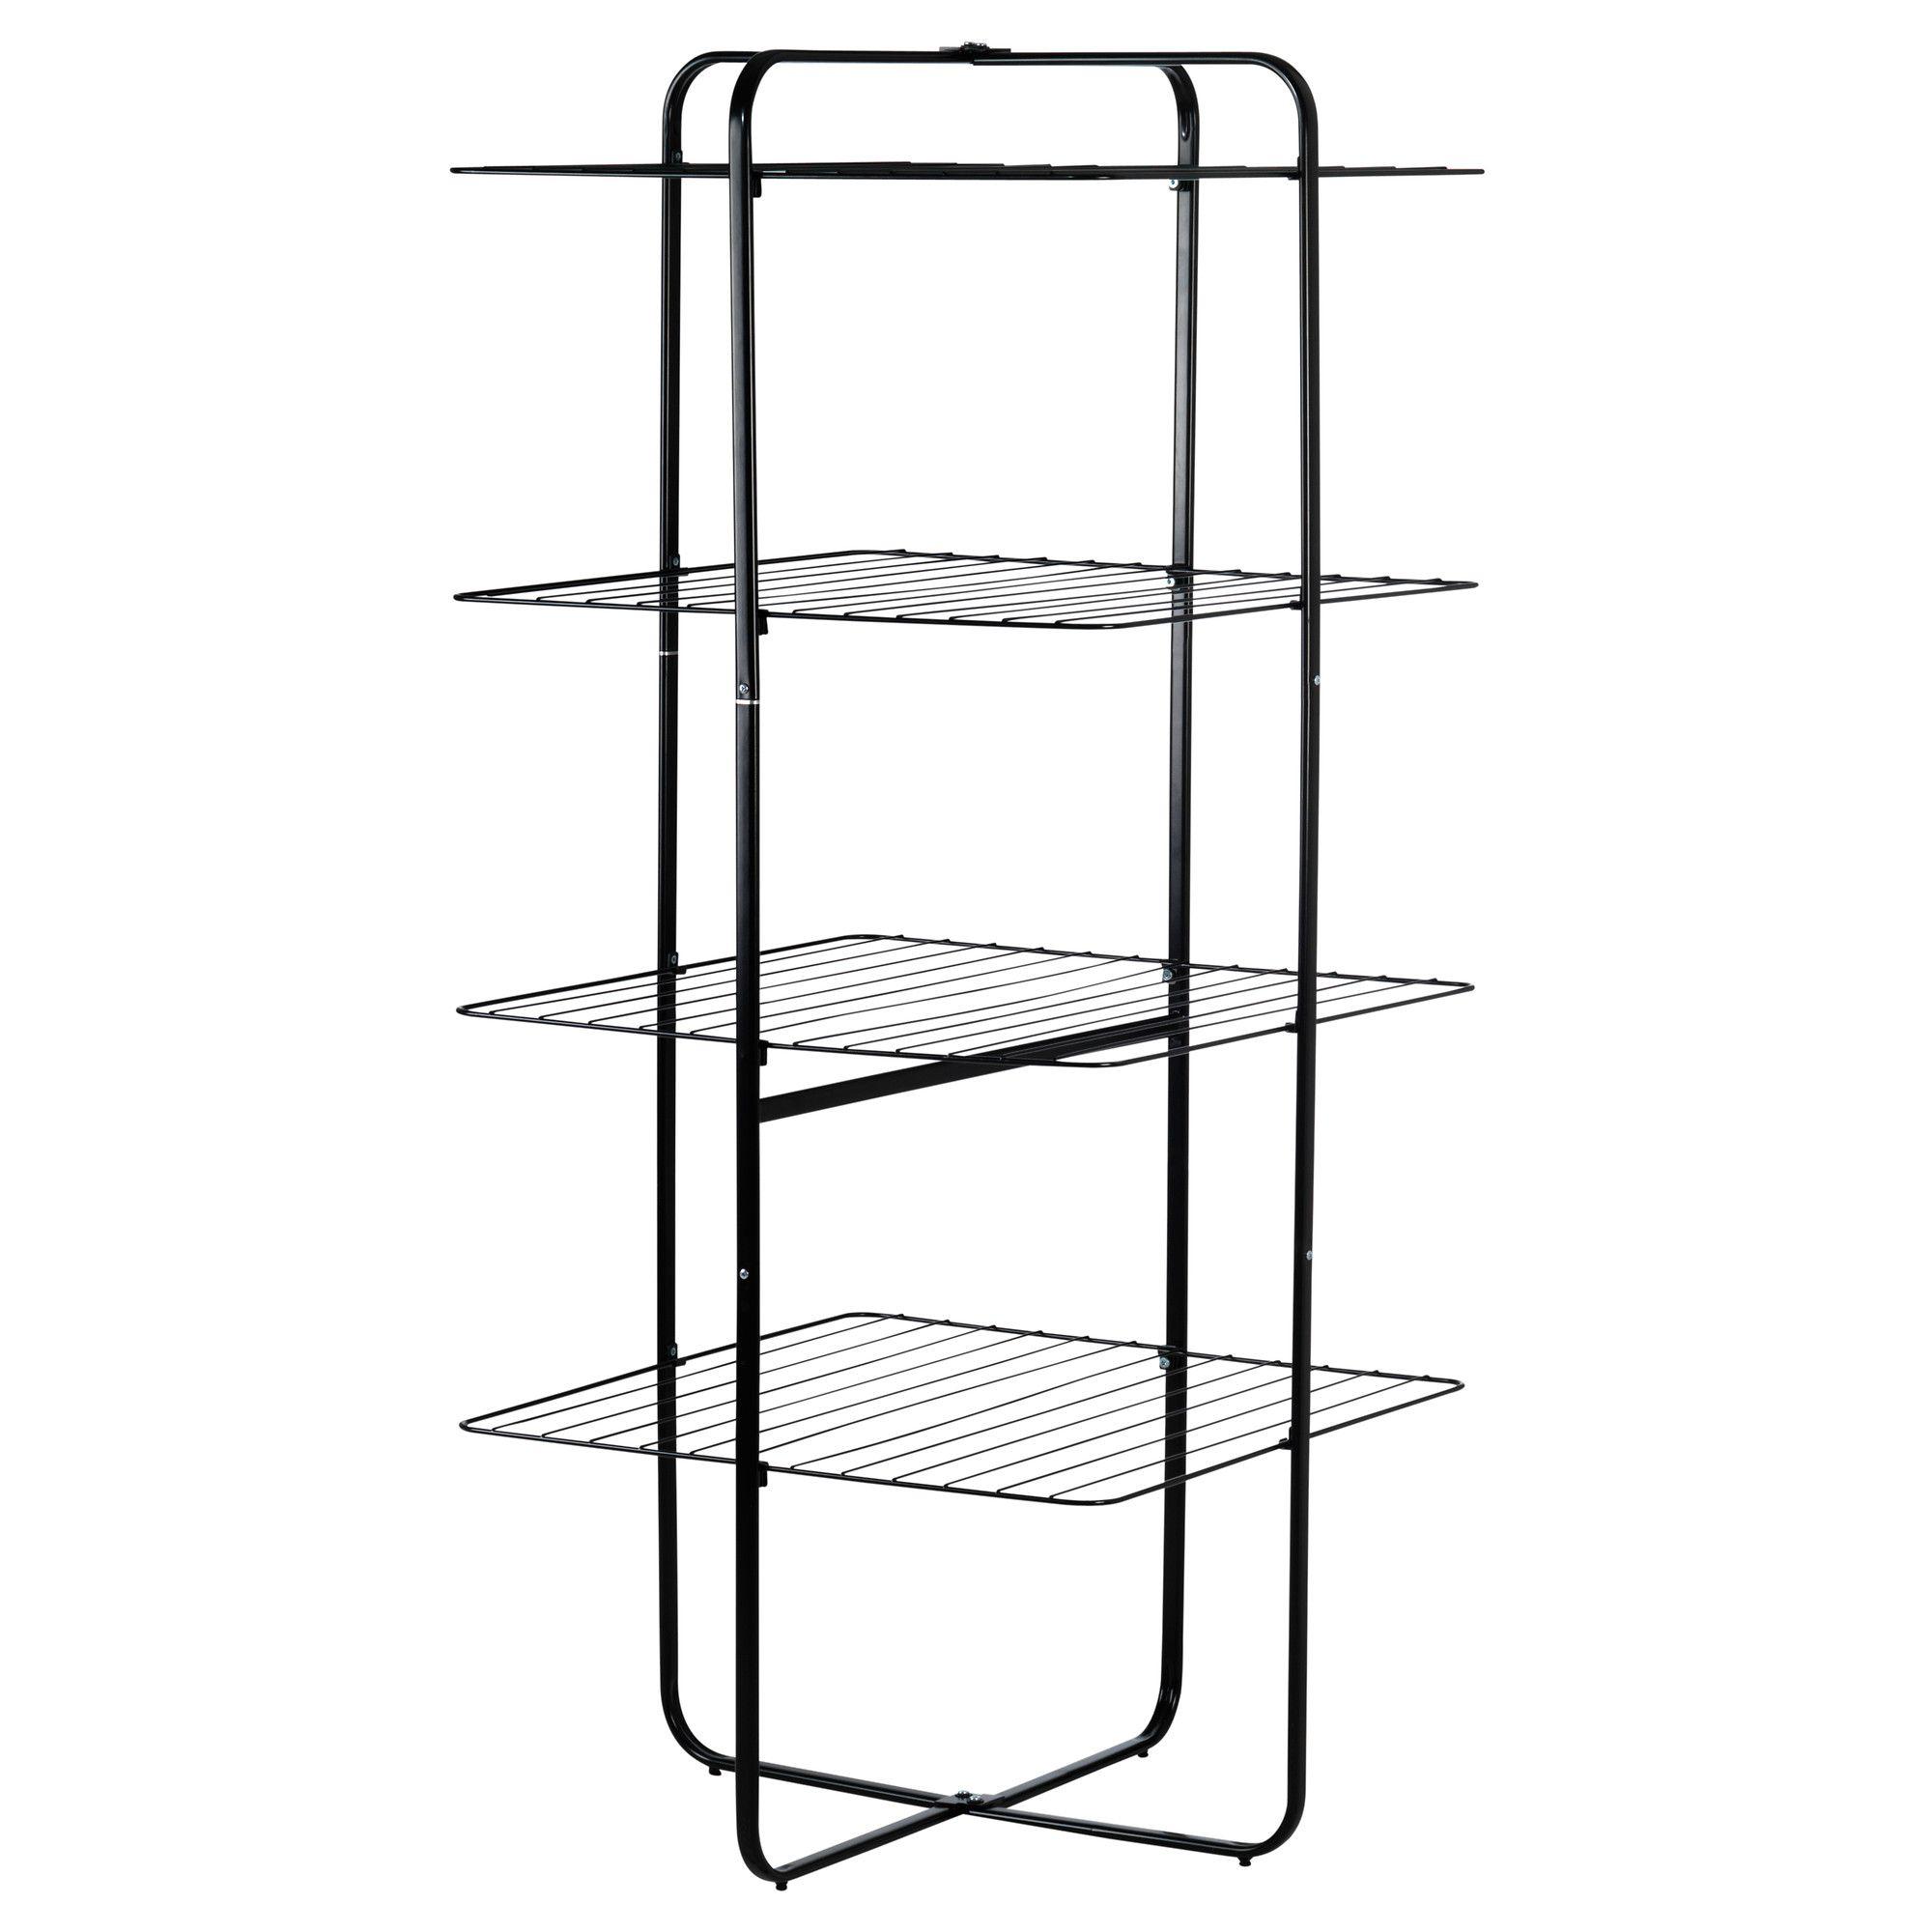 Ikea Wäscheständer 30 mulig drying rack 4 tiers black ikea laundry racks